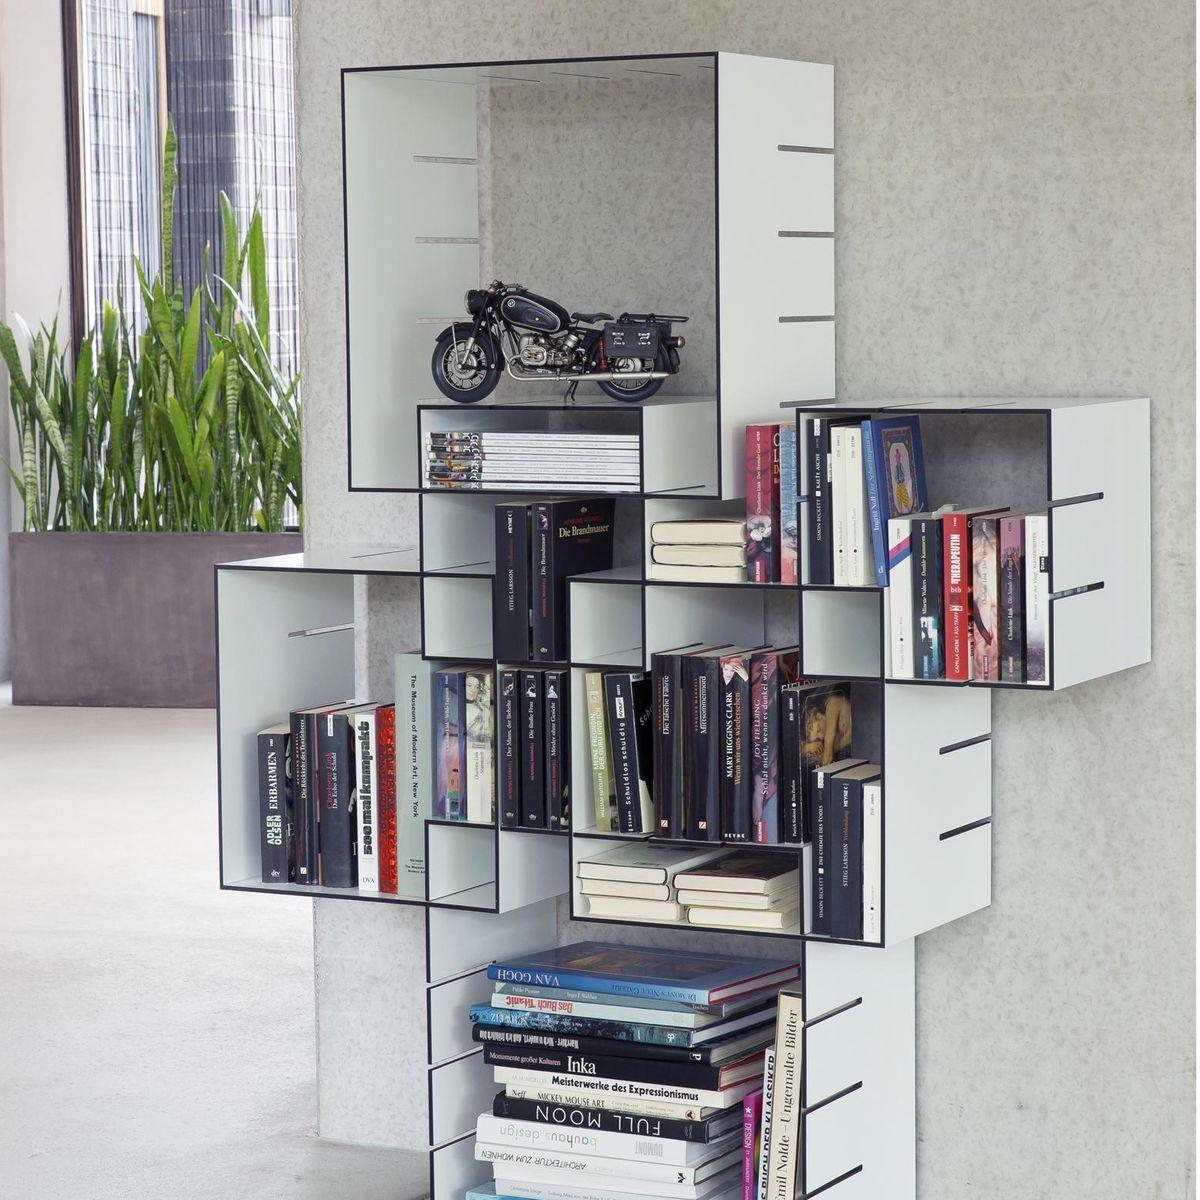 wandregal 20 cm tief cool regal wei cm breit regalwand. Black Bedroom Furniture Sets. Home Design Ideas